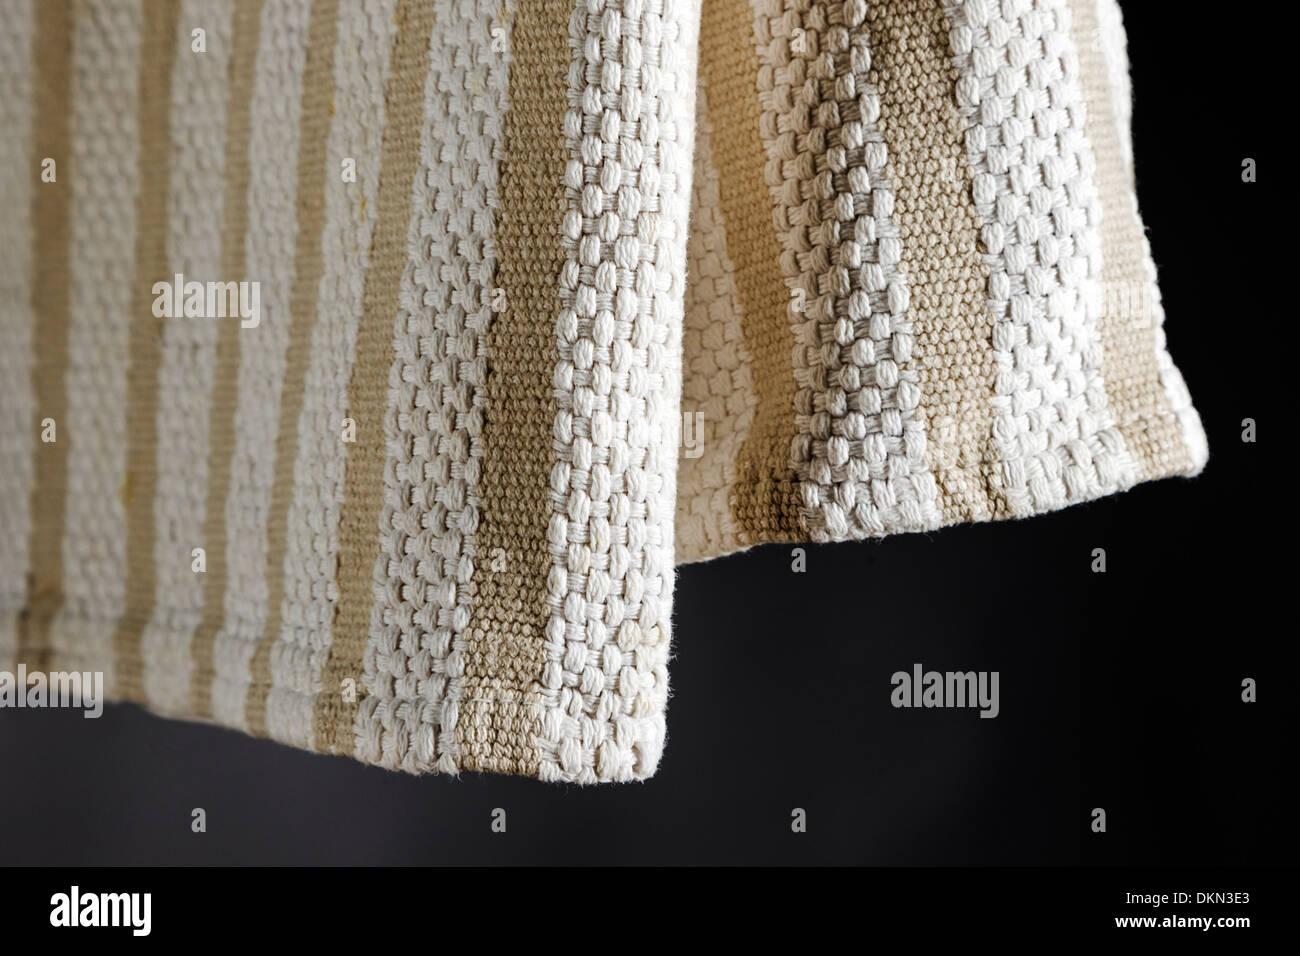 Studio photograph of kitchen dish towel - Stock Image